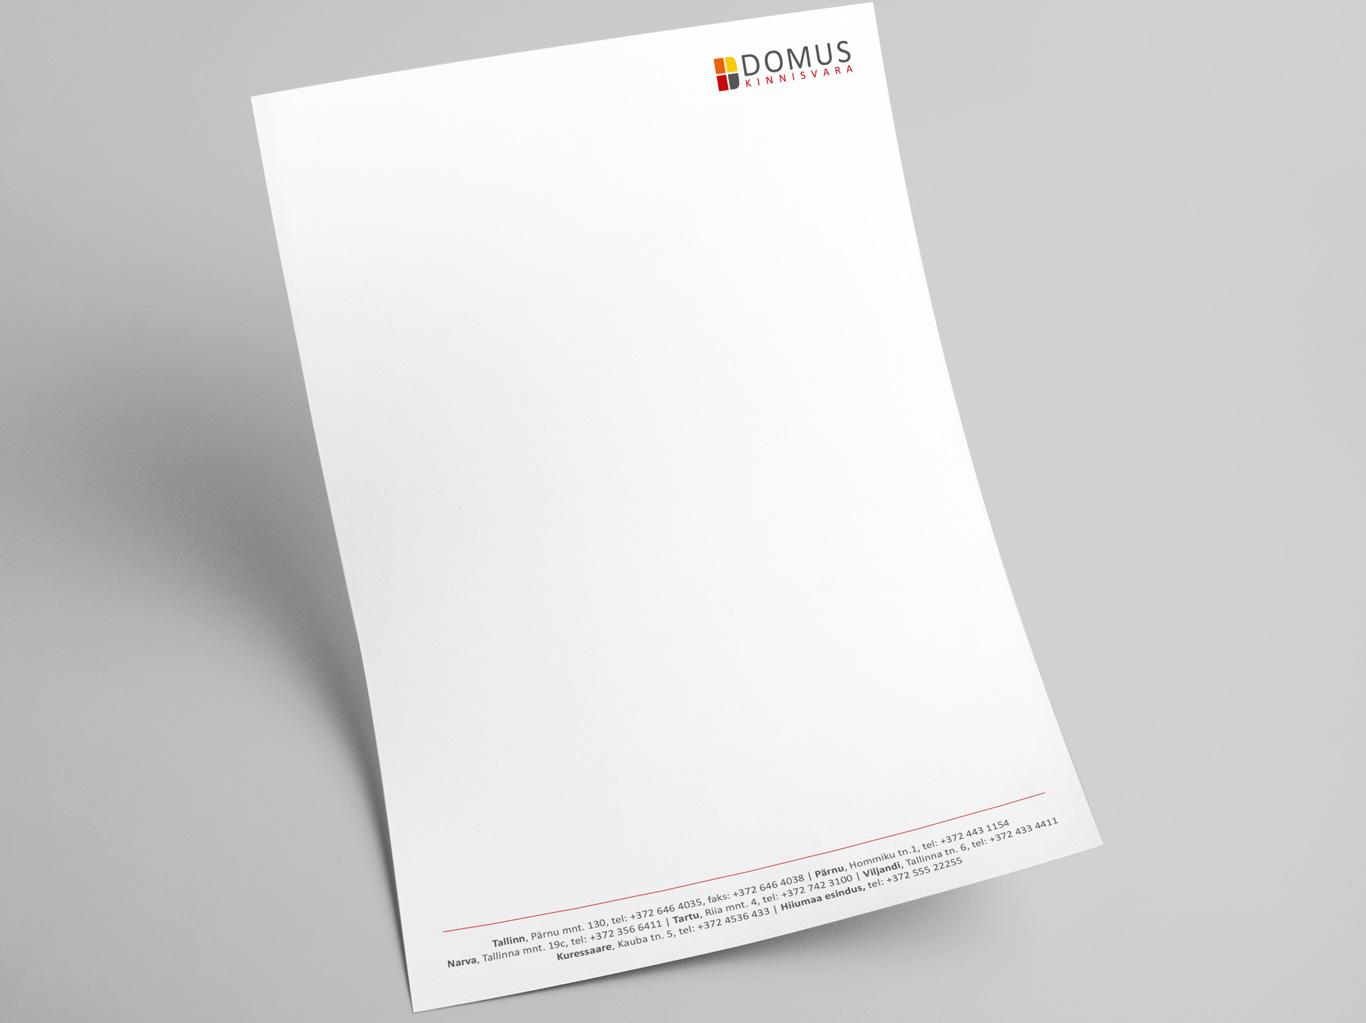 domus-A4-Paper-PSD-MockUp